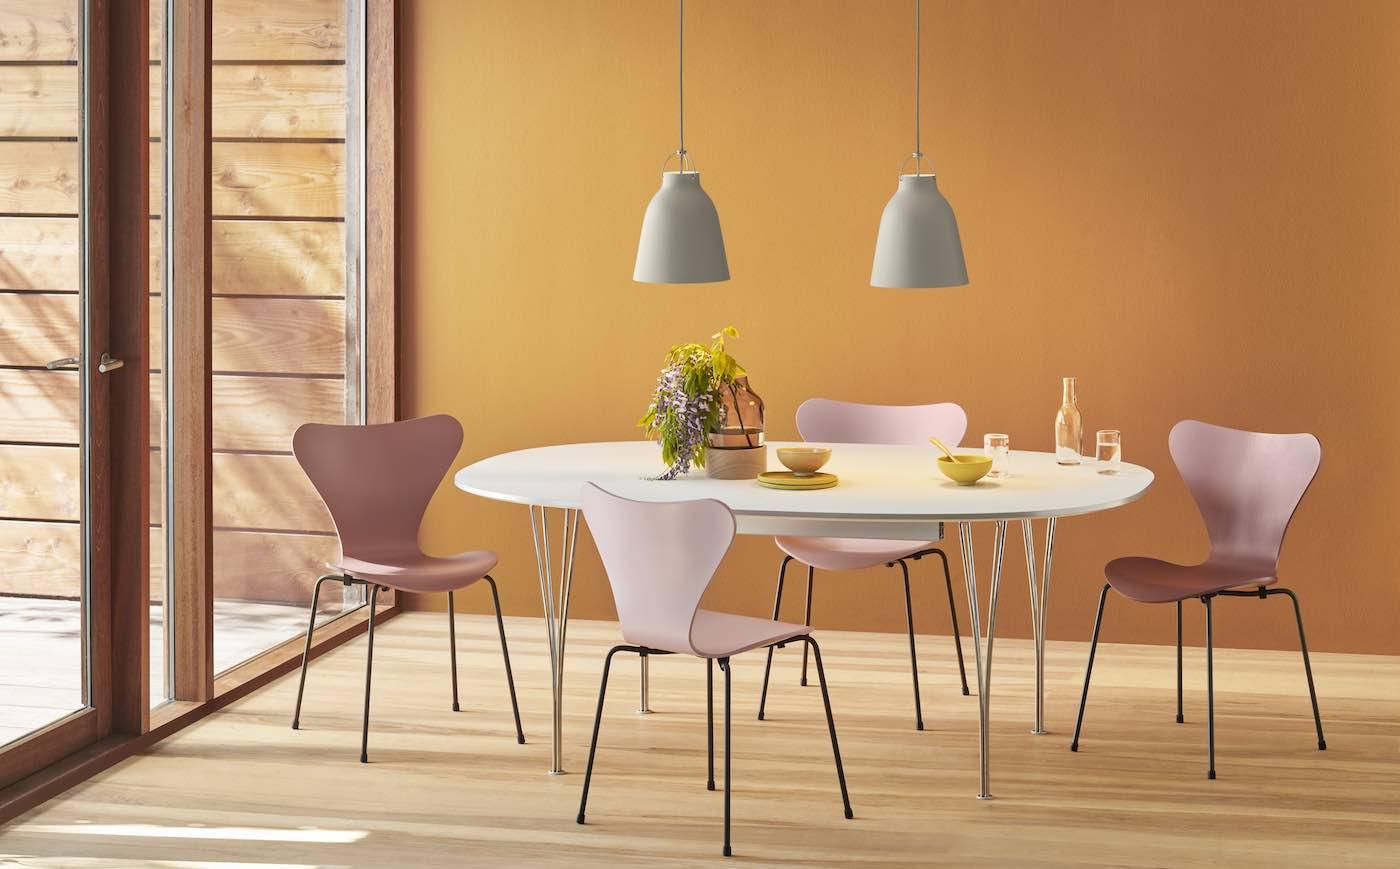 Arne Jacobsen Stuhl, neue Farbe, Ant, Series 7, Grand Prix, Arne Jacobsen, Dänisches Design, Klassiker